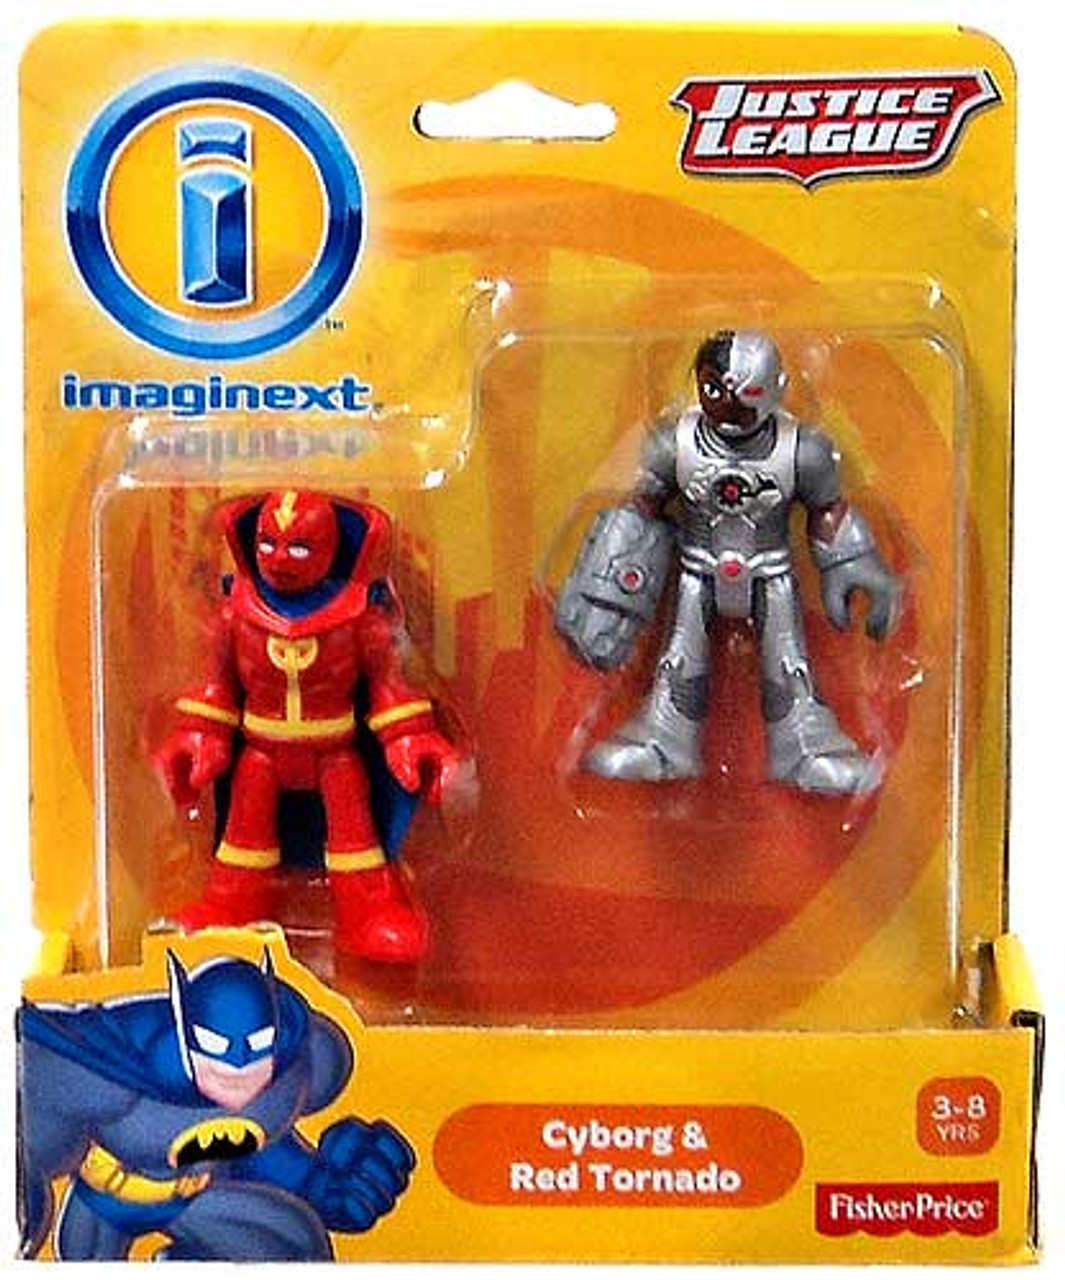 Fisher Price DC Super Friends Justice League Imaginext Cyborg & Red Tornado Exclusive Mini Figures